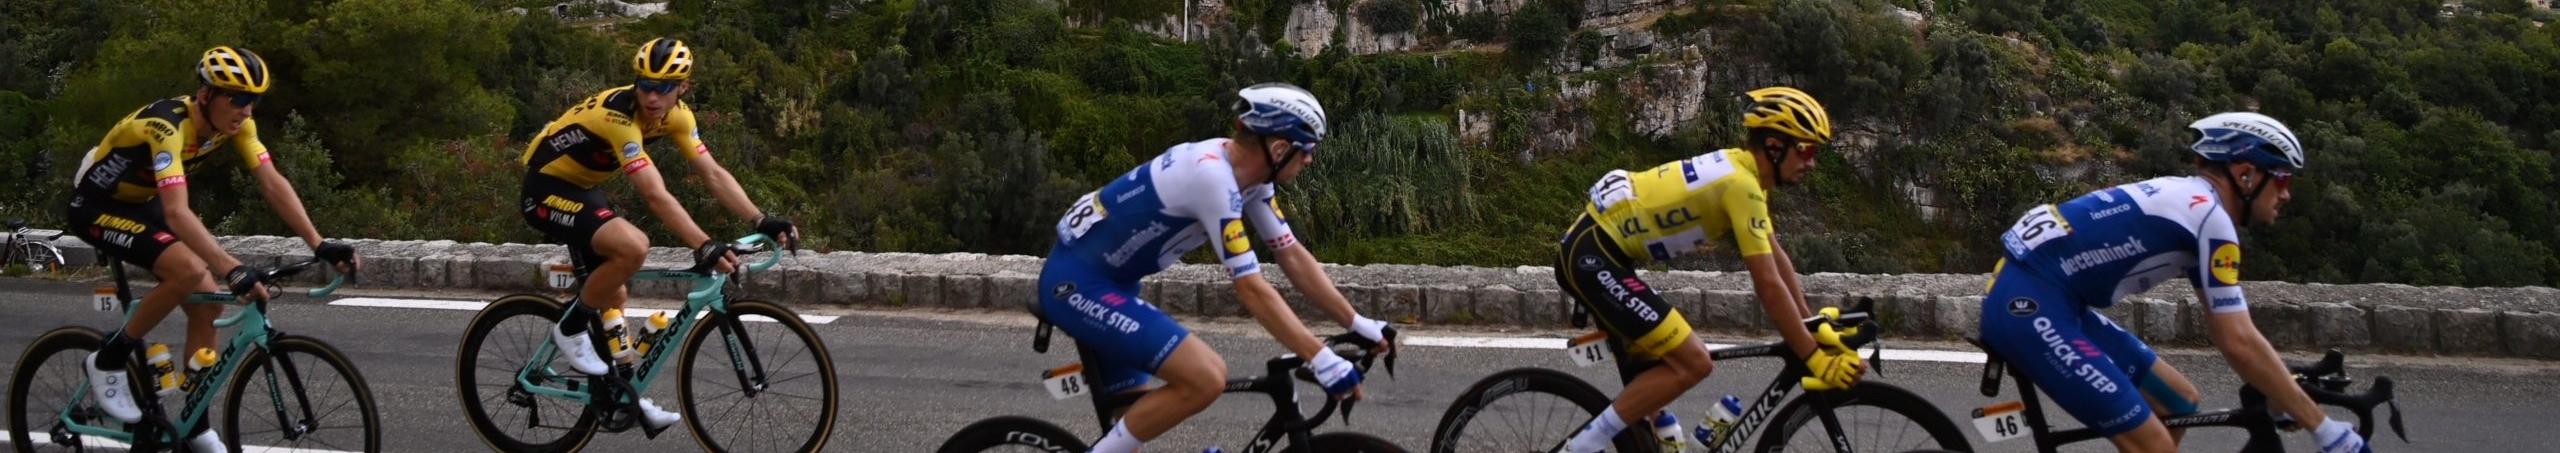 Tour De France 2020: quote, scommesse e pronostico 4ª tappa